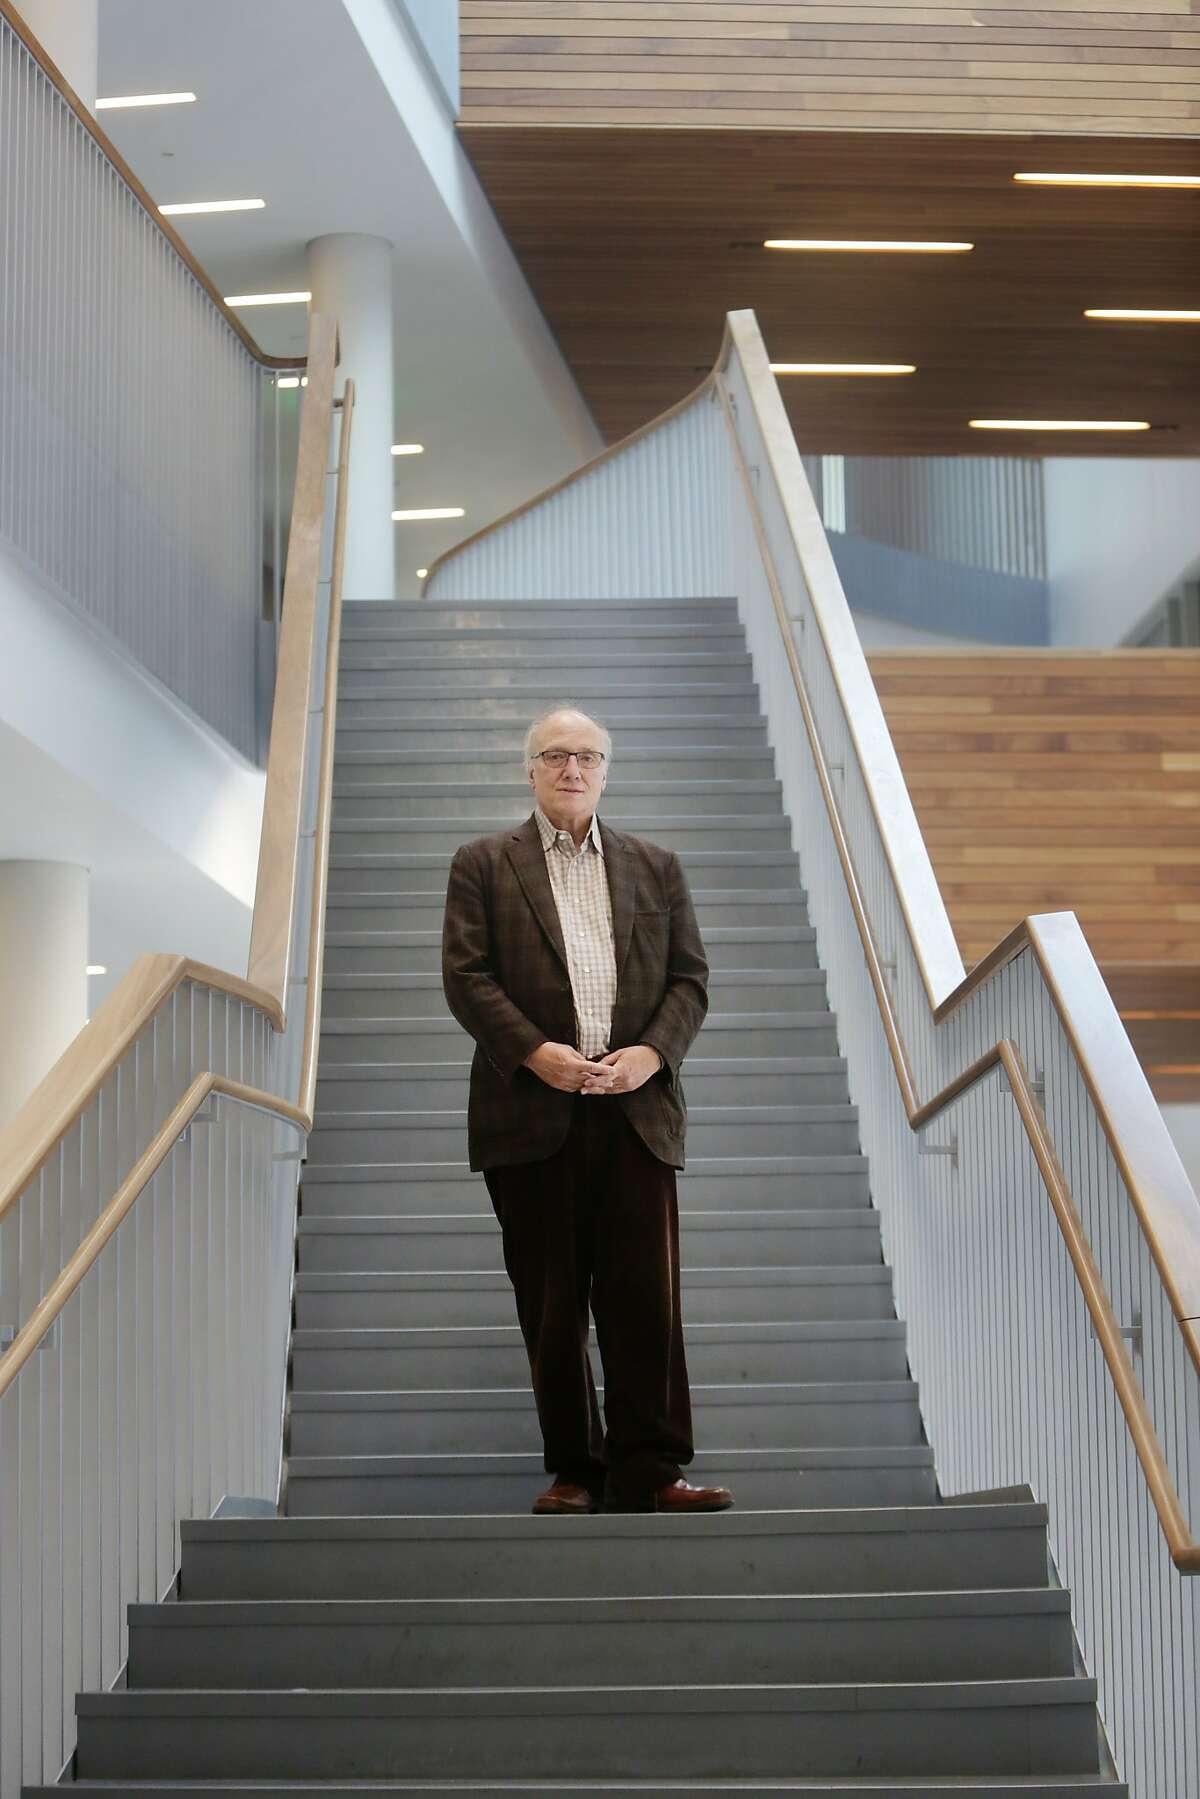 Dr. Bruce Miller, UCSF behavioral neurologist, poses for a portrait at UCSF's Sandler Center for Neurosciences on Wednesday, November 11, 2015 in San Francisco, Calif.